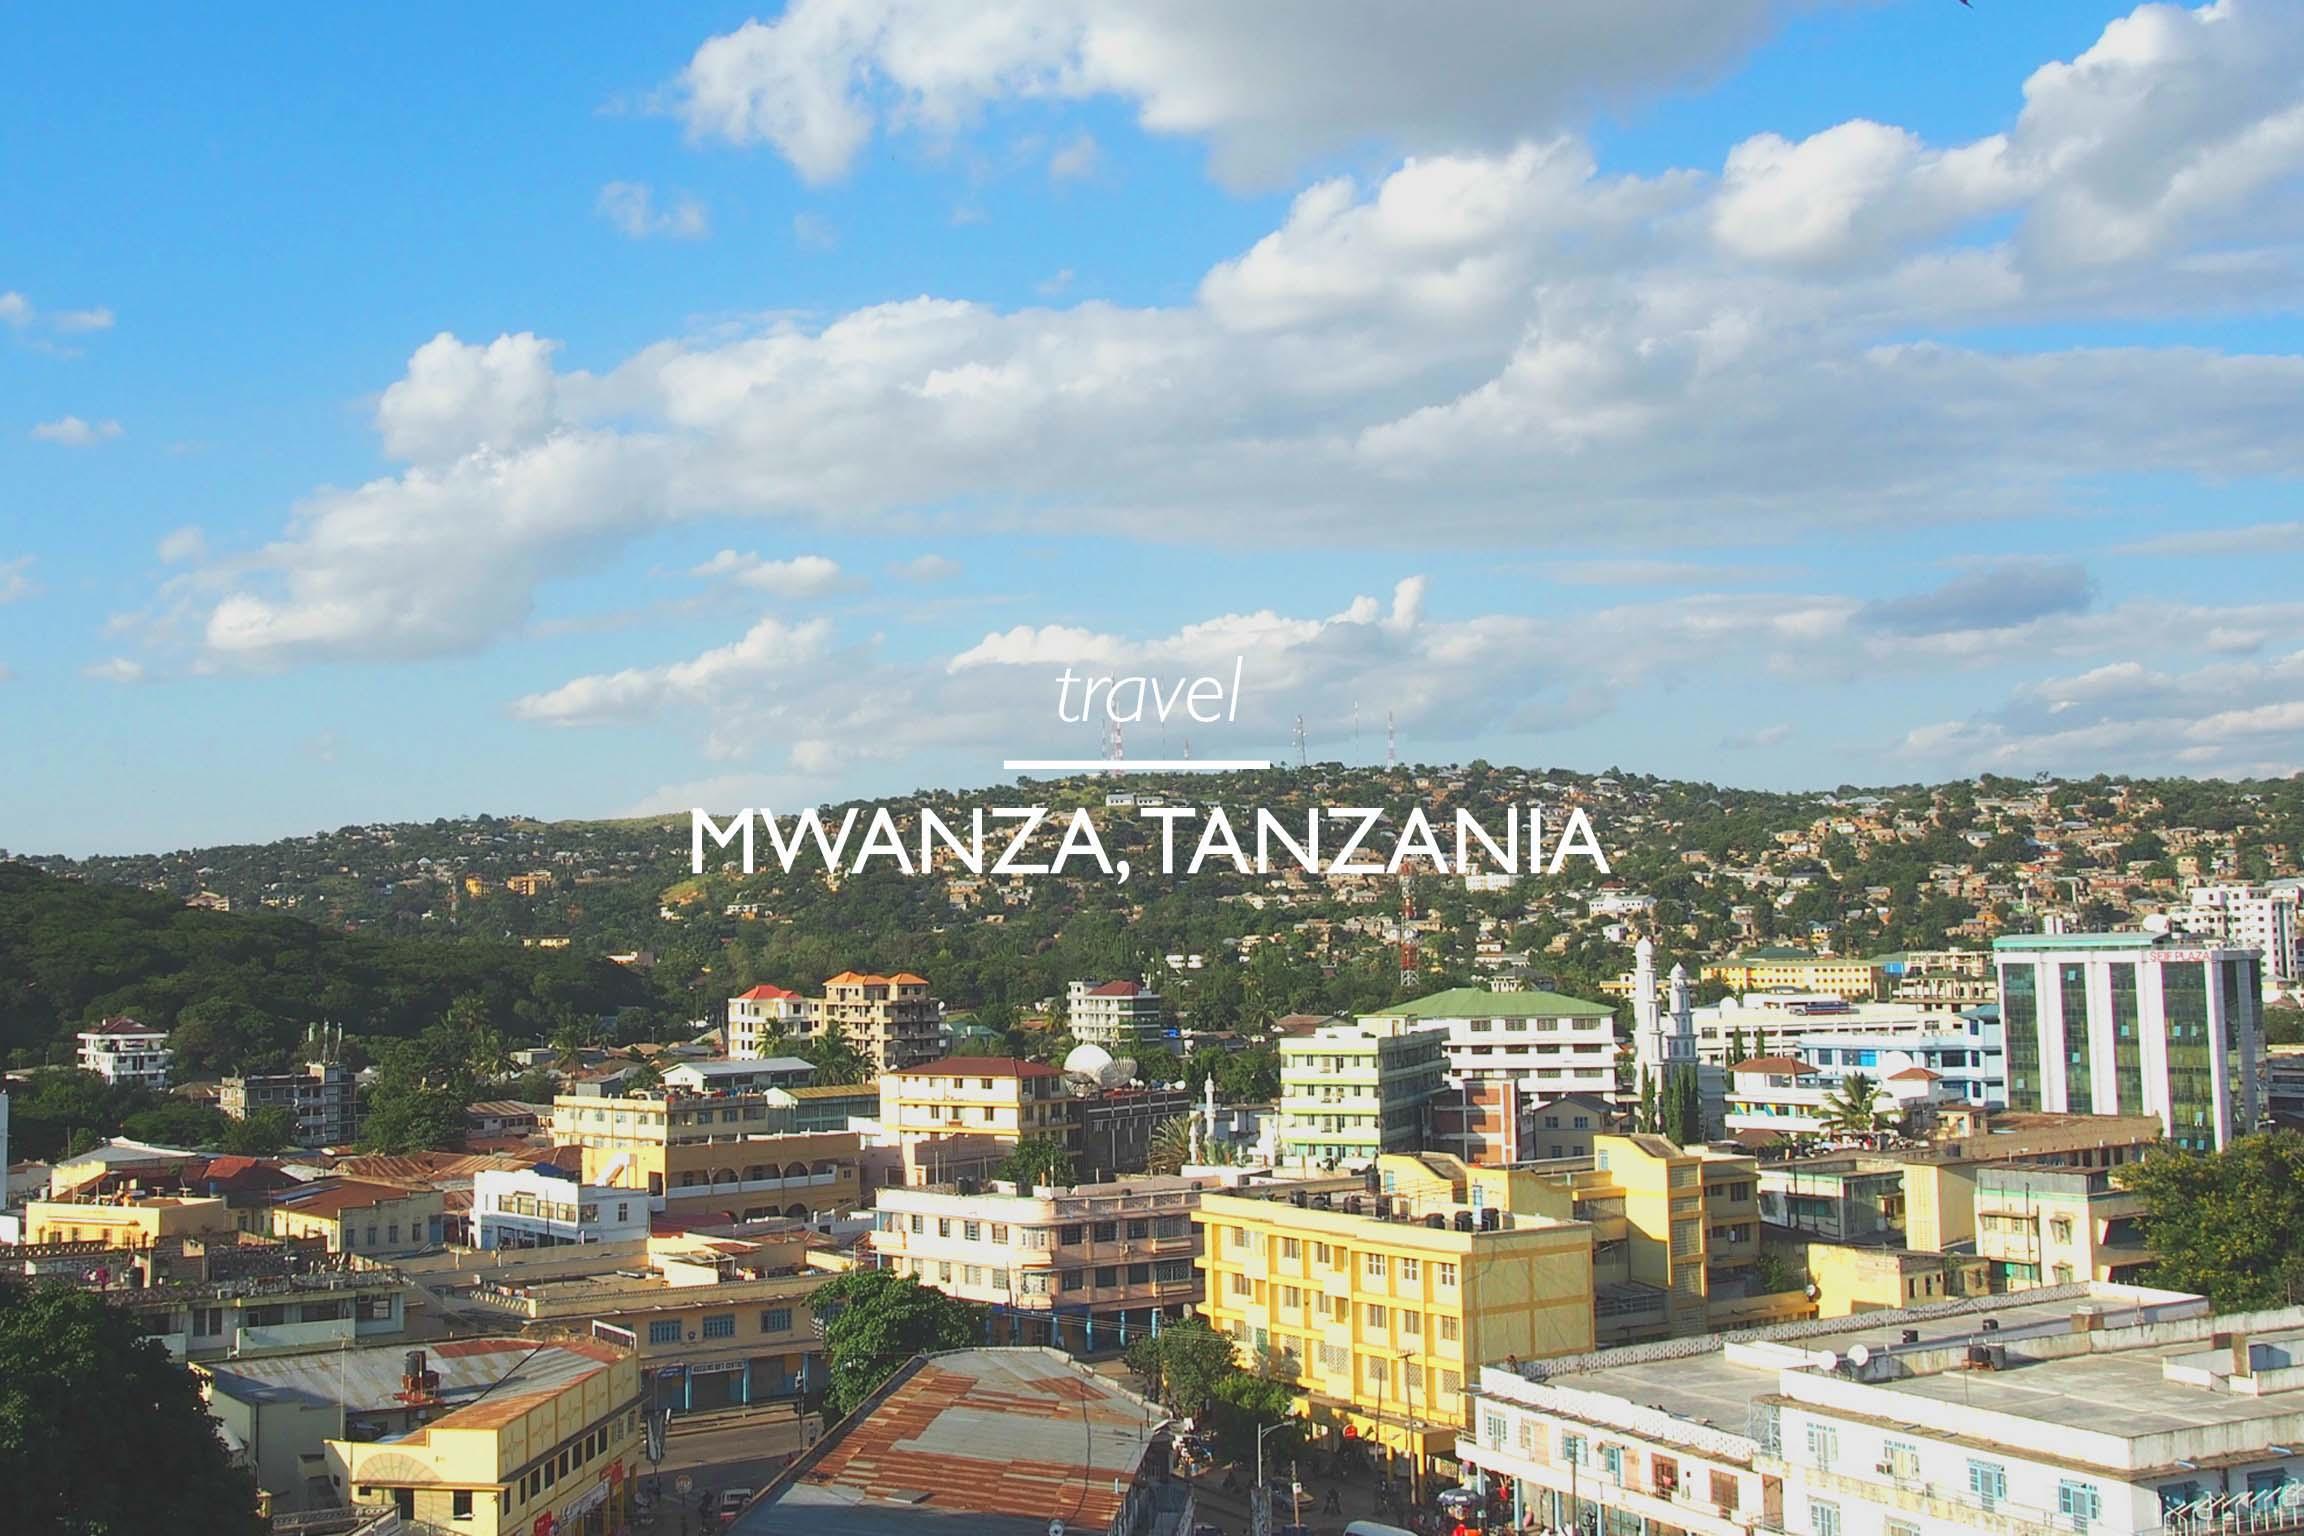 The Rock City, Mwanza – www.kibogoji.com